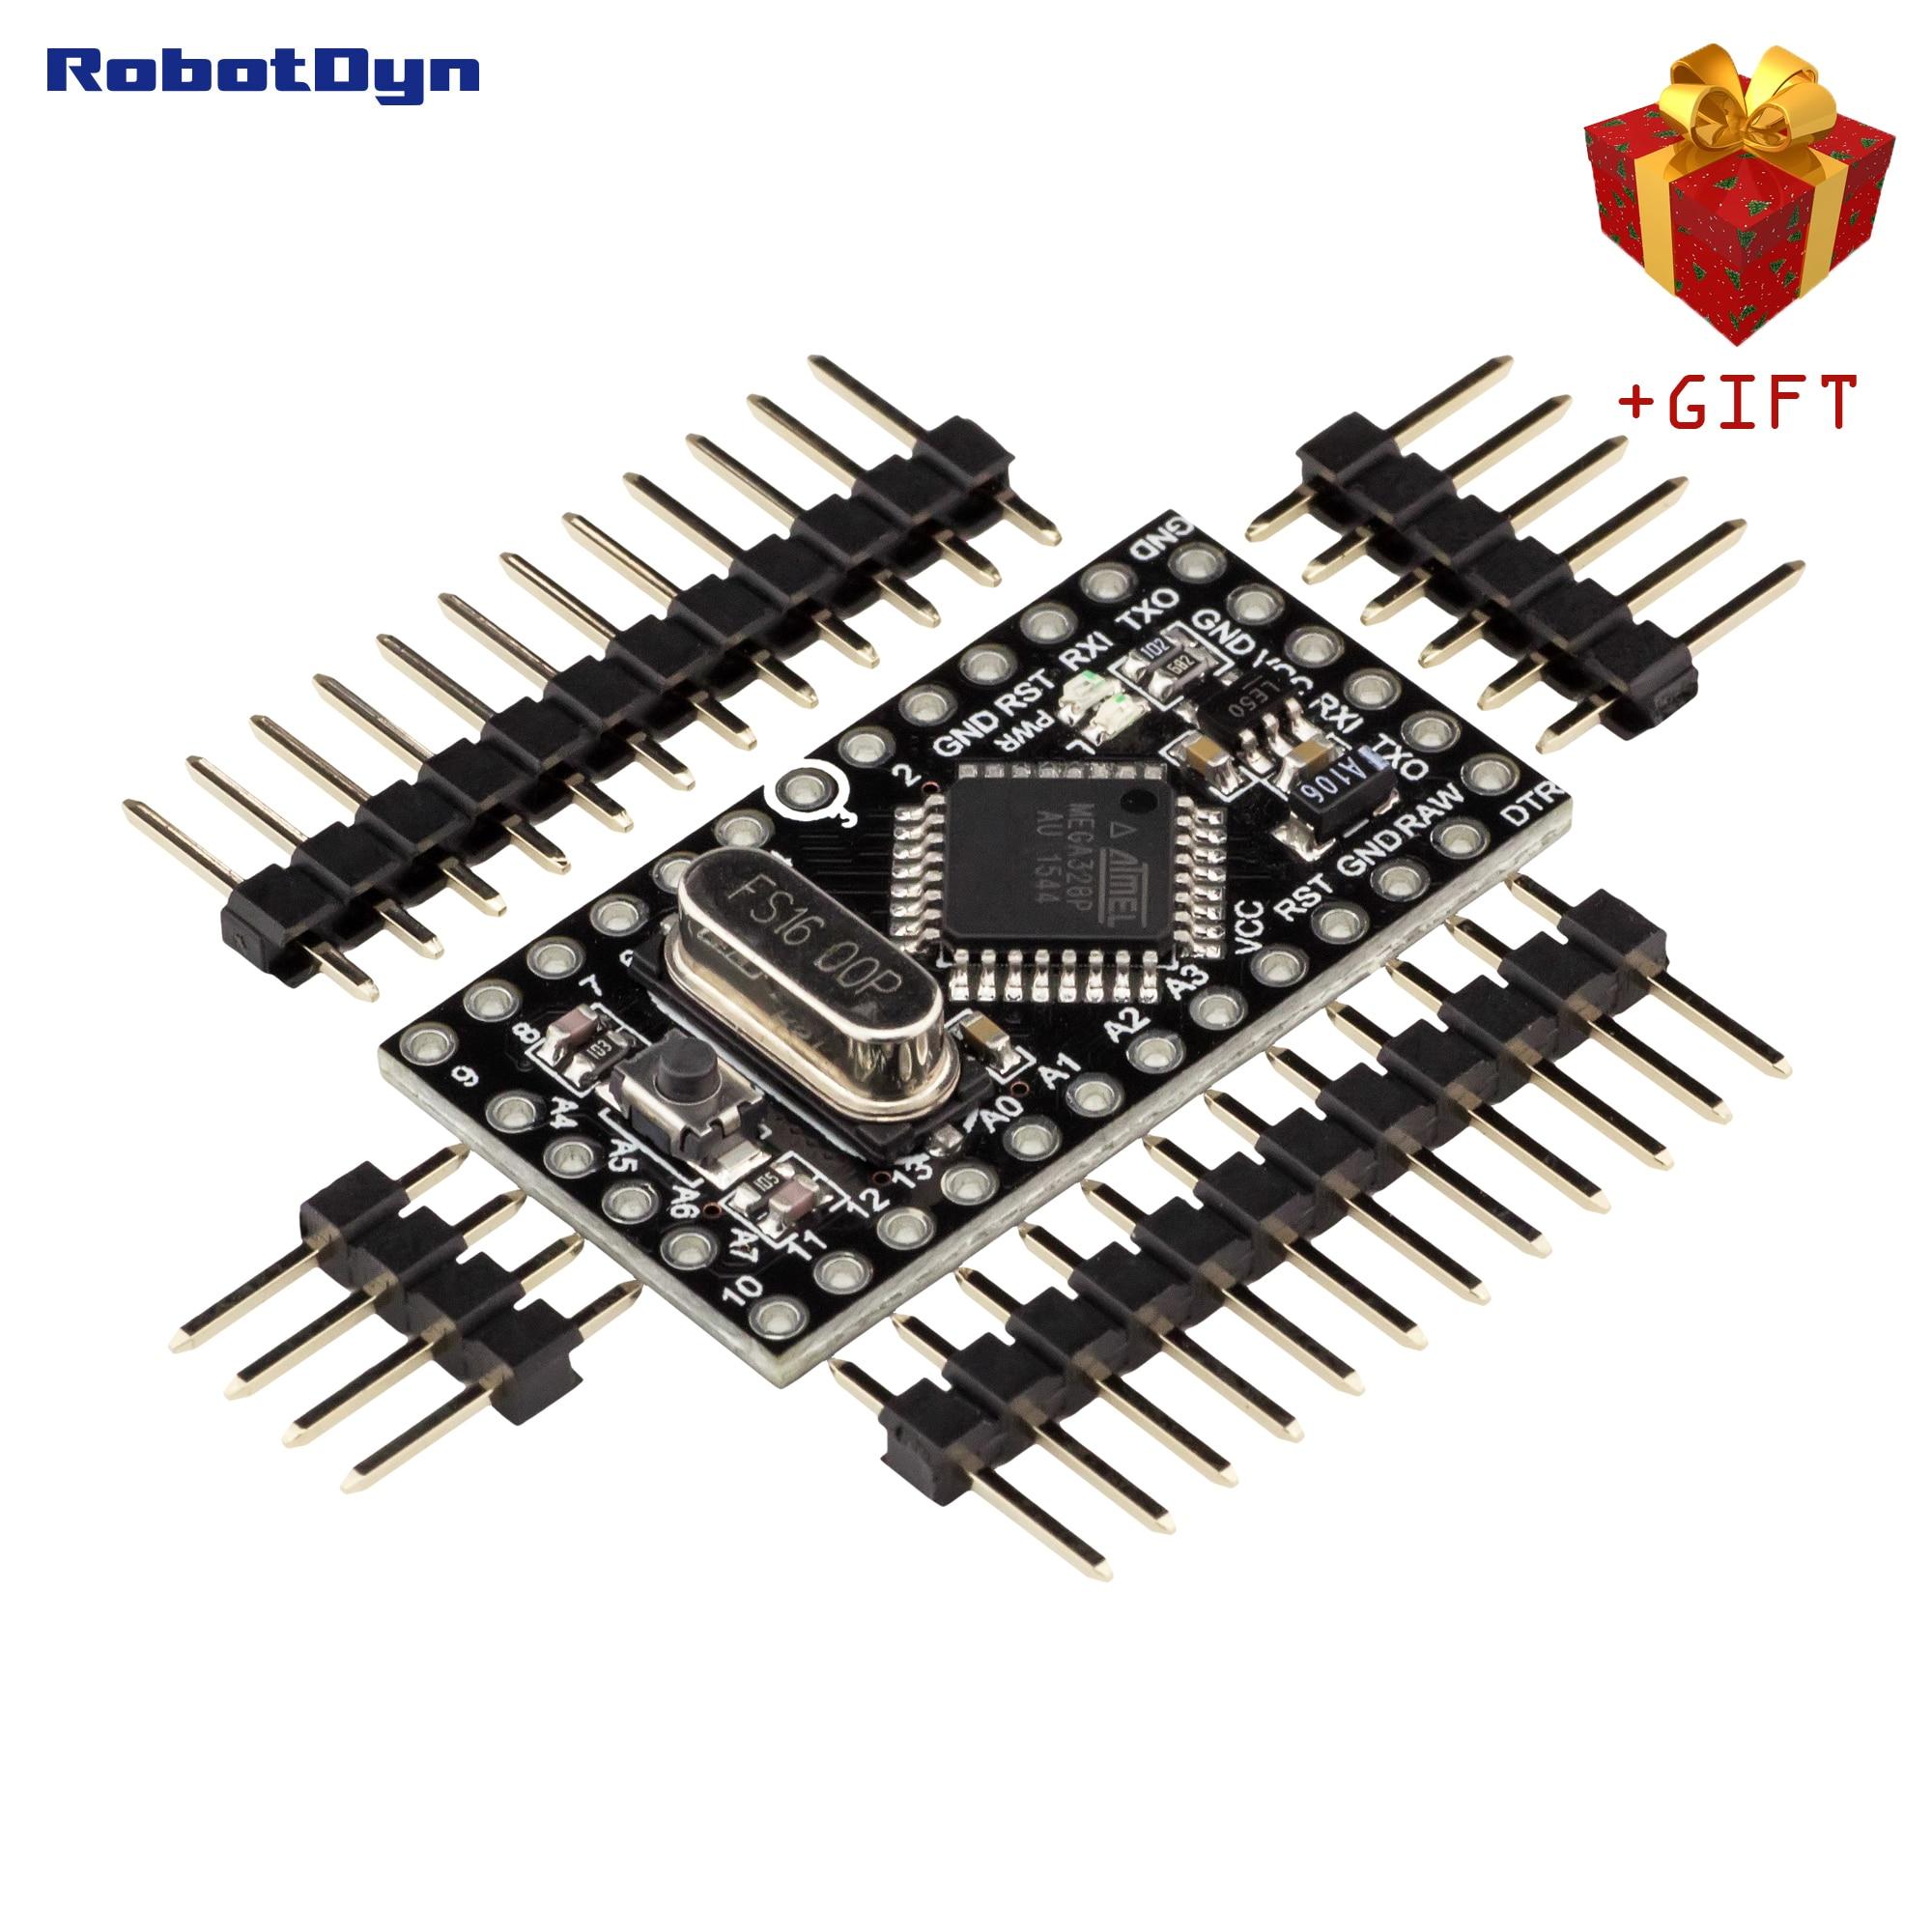 Pro Mini ATmega328P 5V, Compatible for Arduino Pro Mini Mega 328. Add A6/A7 pins